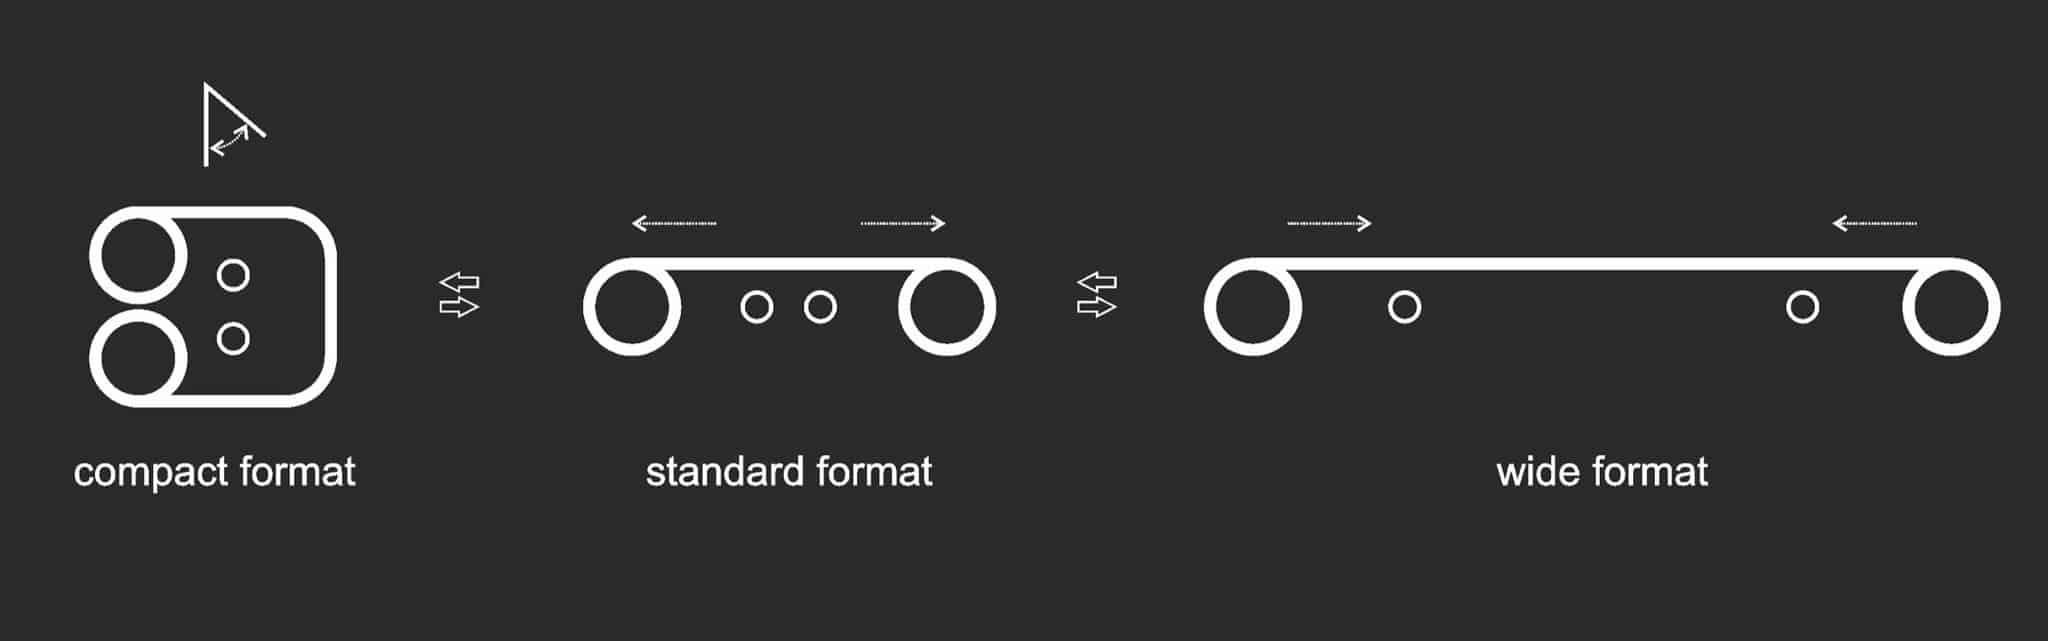 Xiaomi Mi MIX foldable rollable concept 4